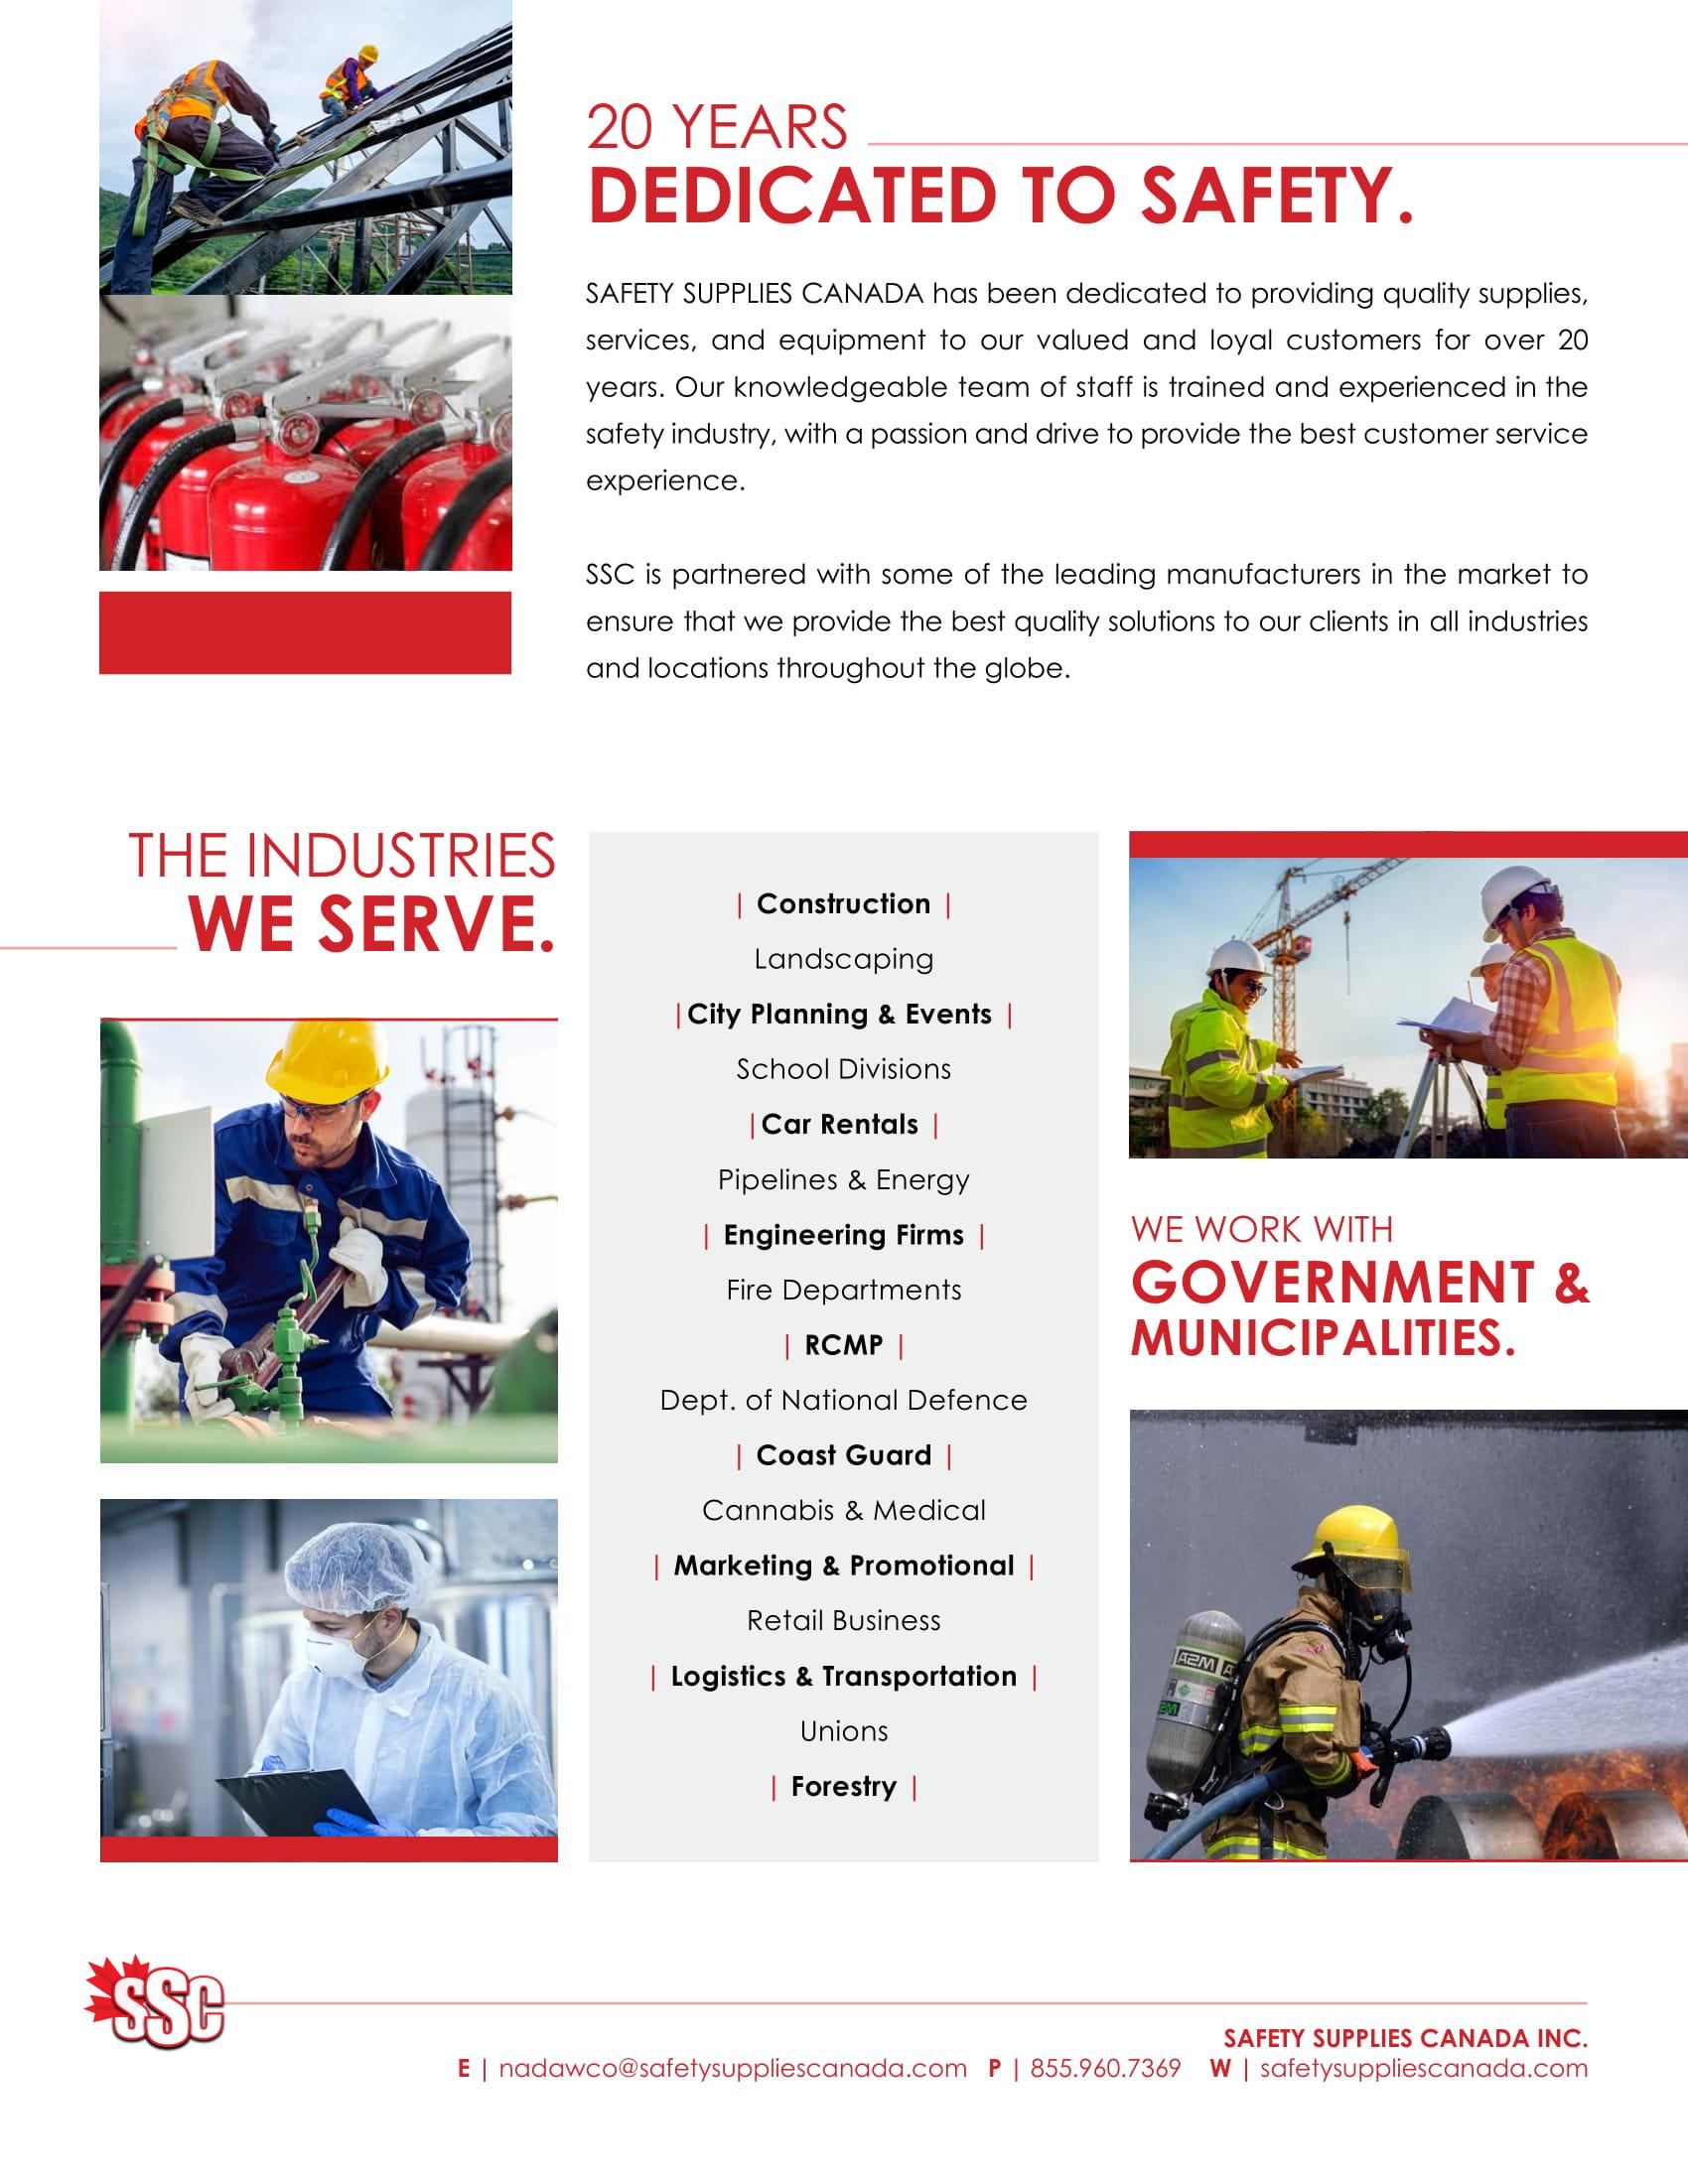 ssc-company-profile-09.29.18-web-2.jpg